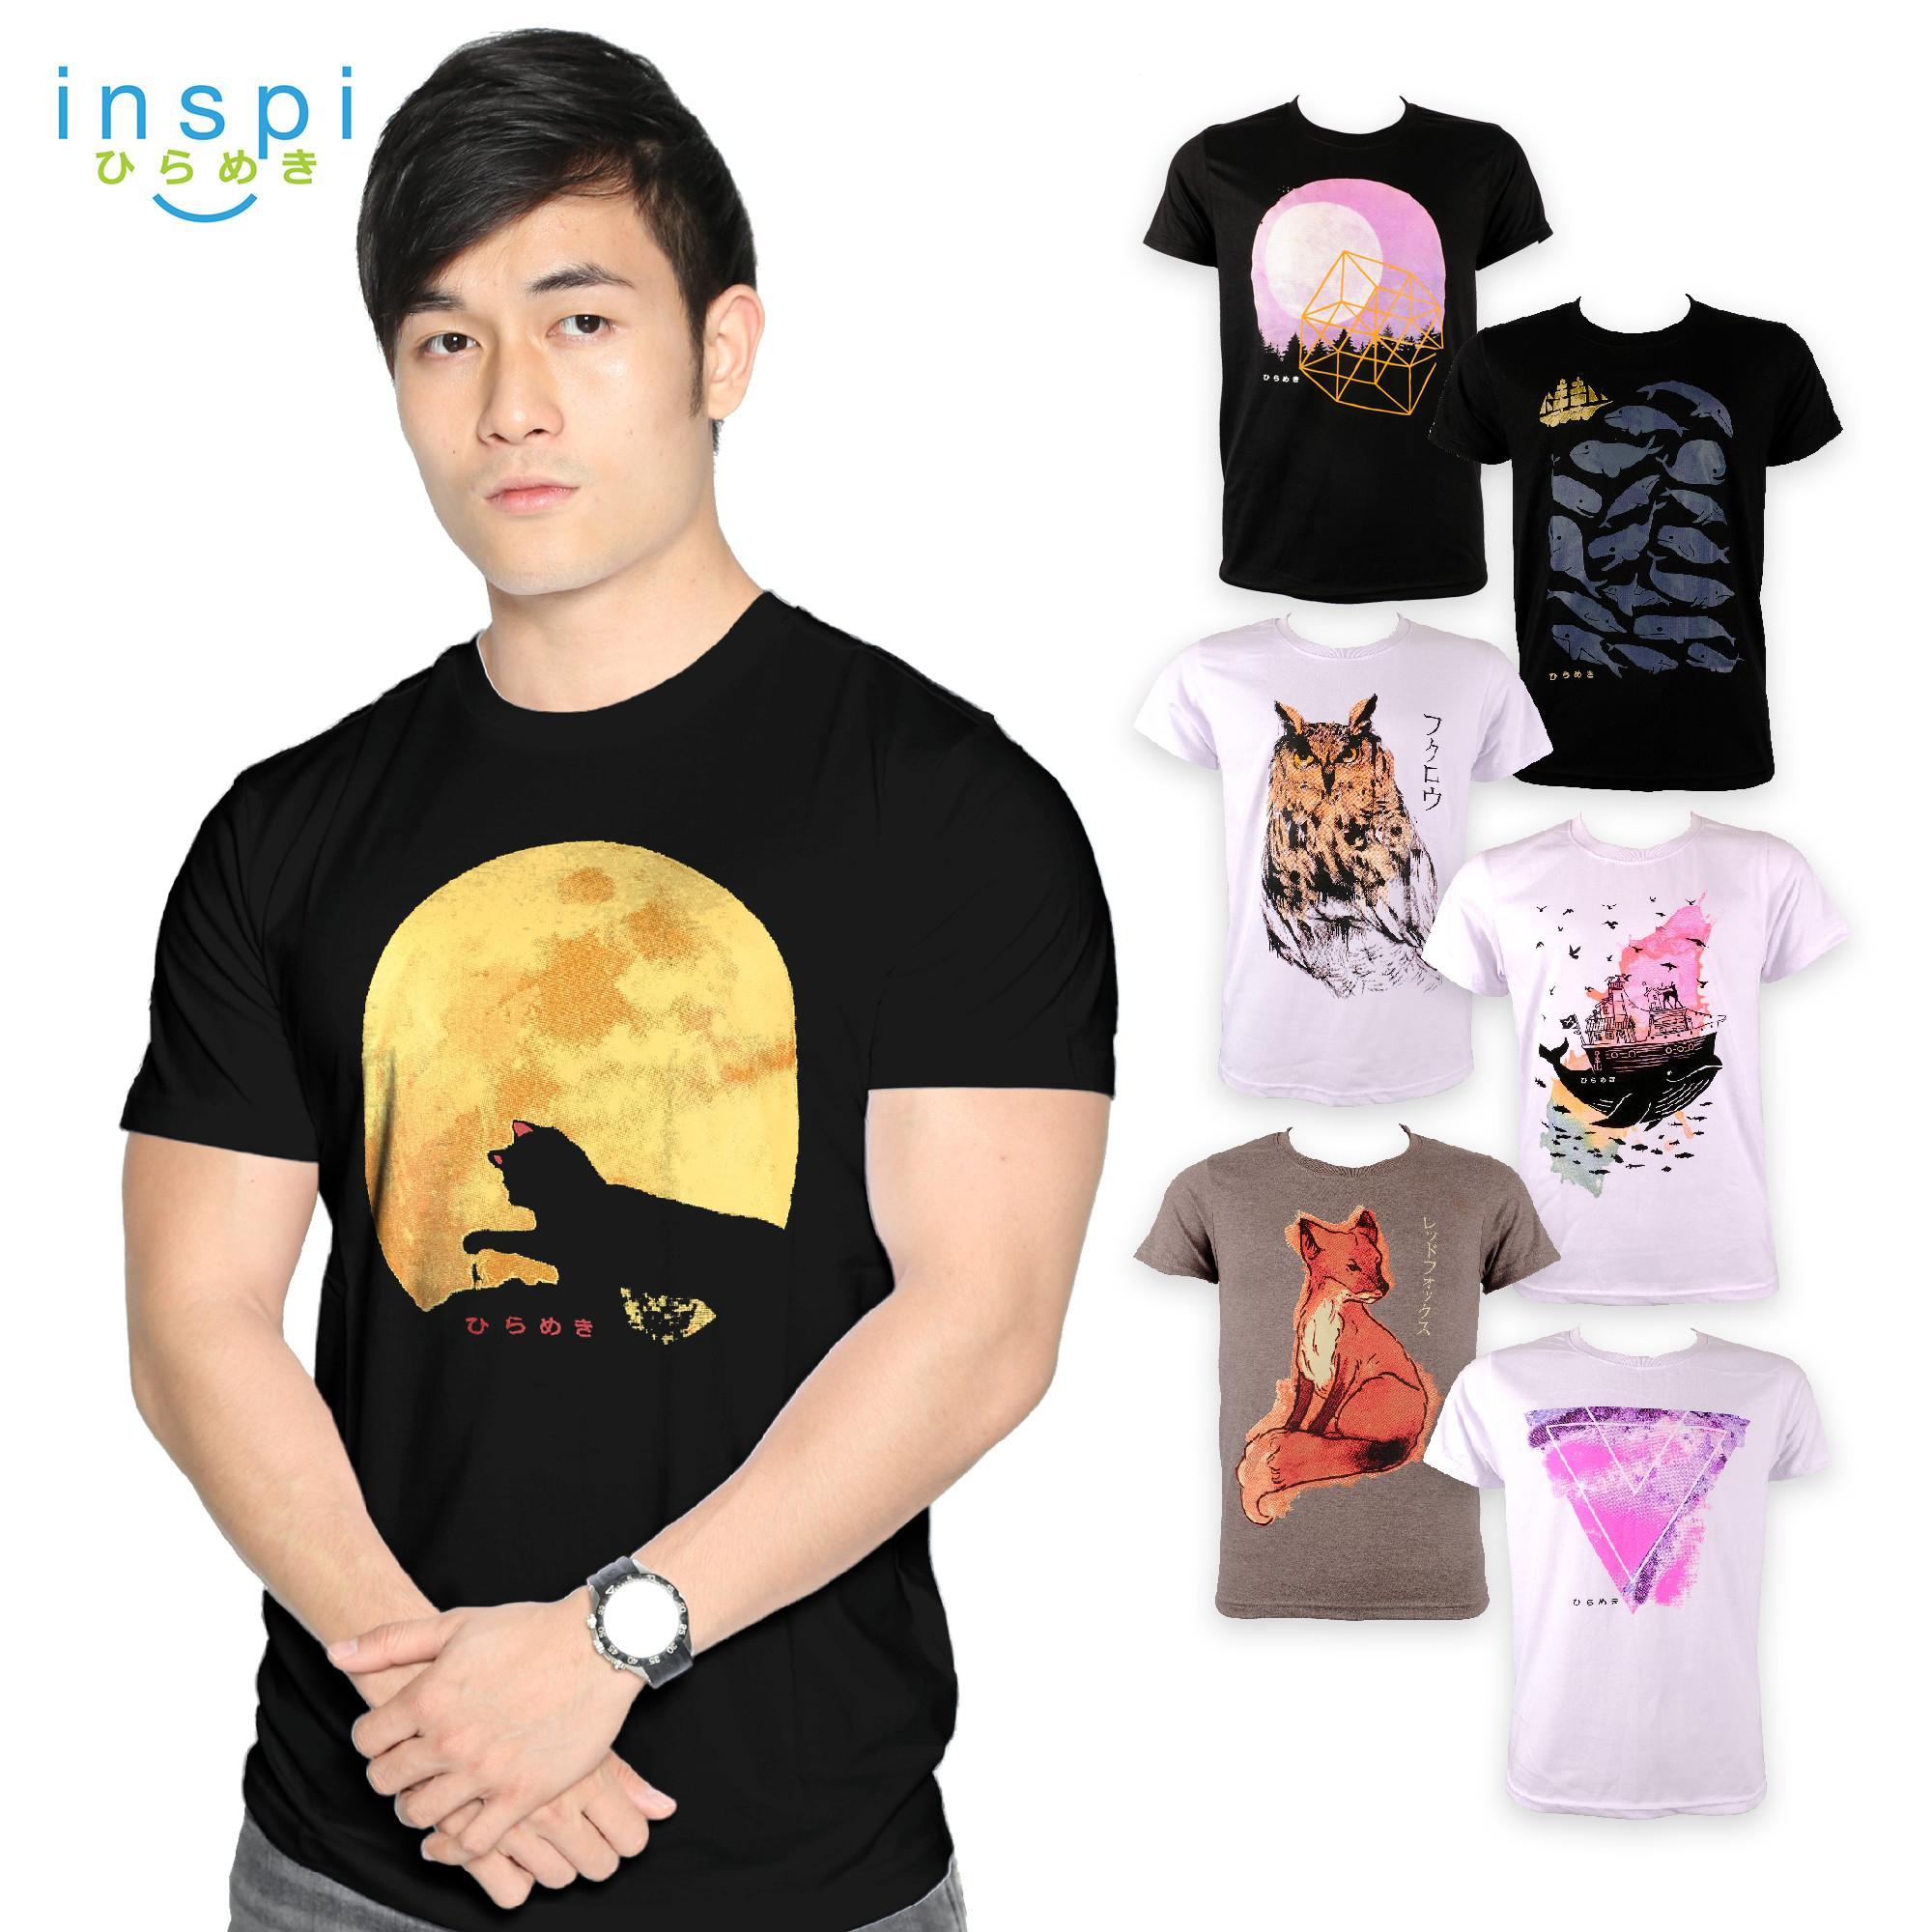 4d6ead64c12b T-Shirt Clothing for Men for sale - Mens Shirt Clothing online ...